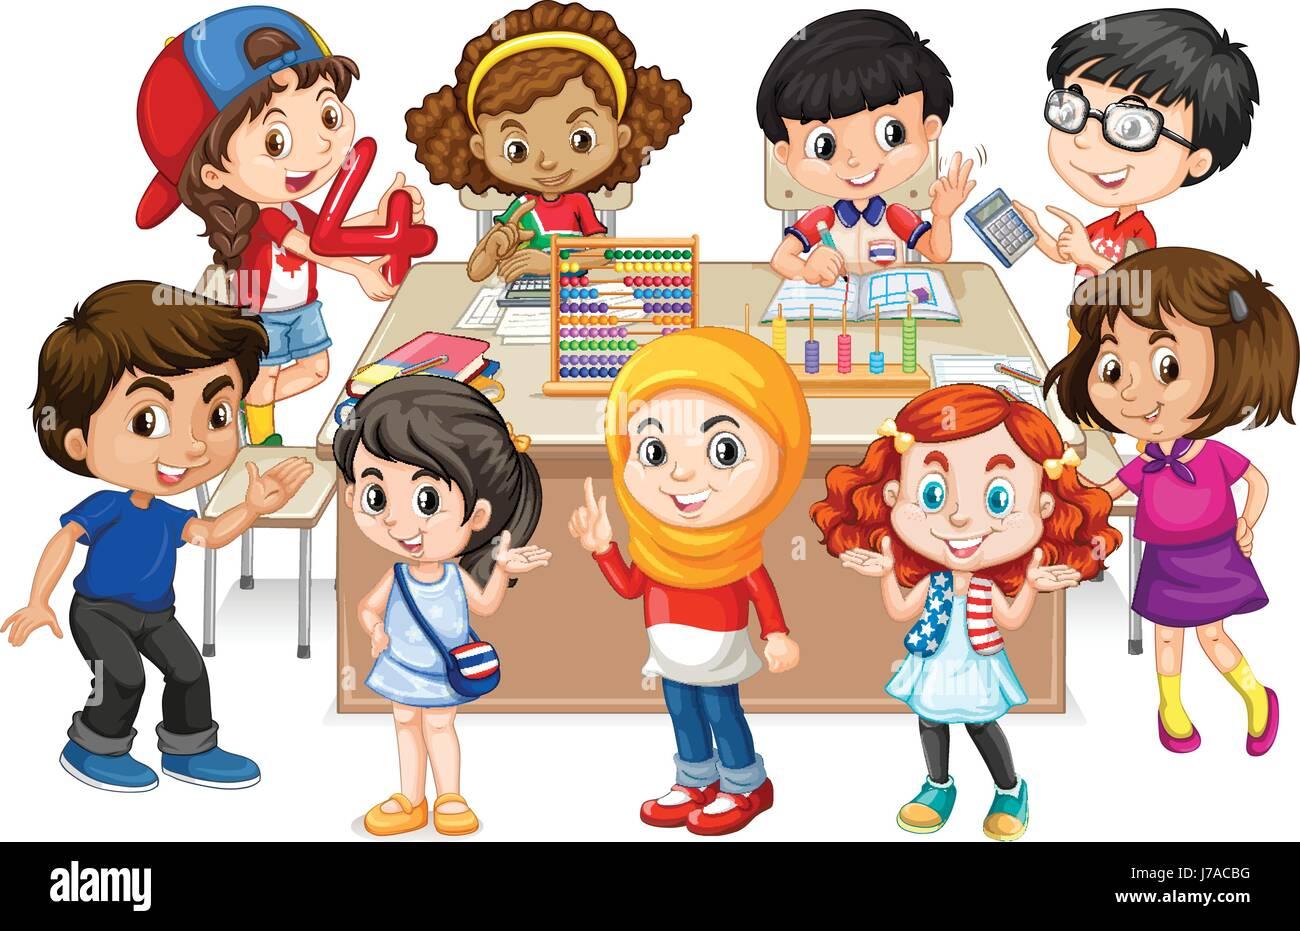 Many kids learning math in classroom illustration Stock Vector Art ...